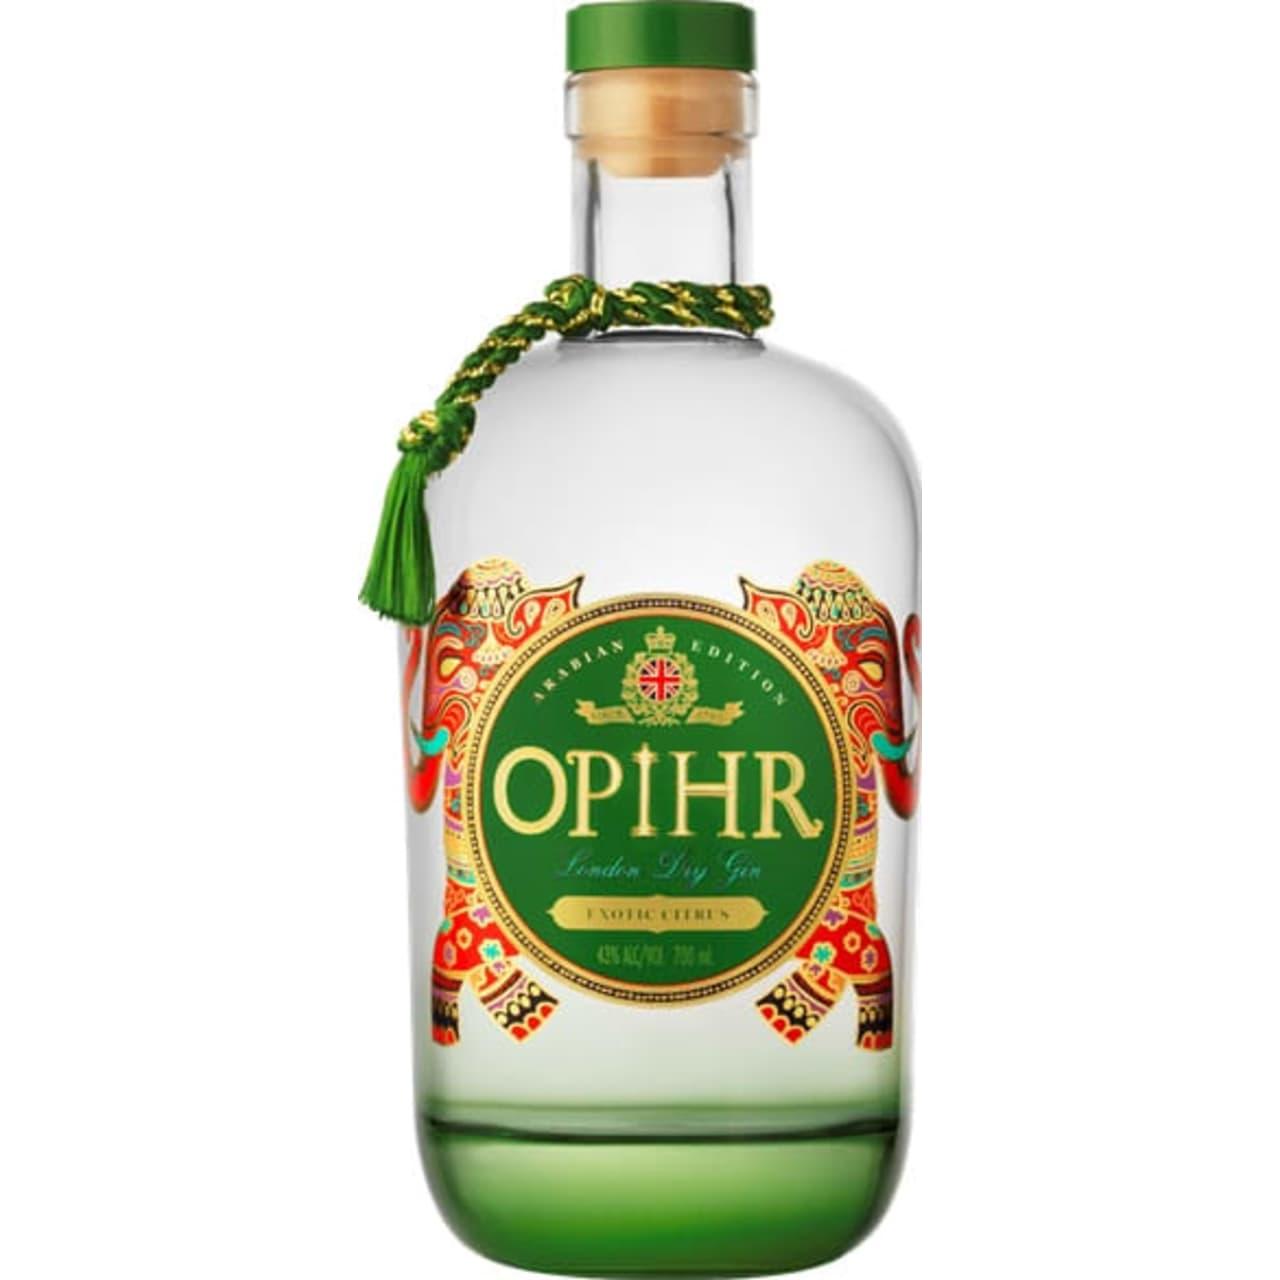 Product Image - Opihr Arabian Edition Gin